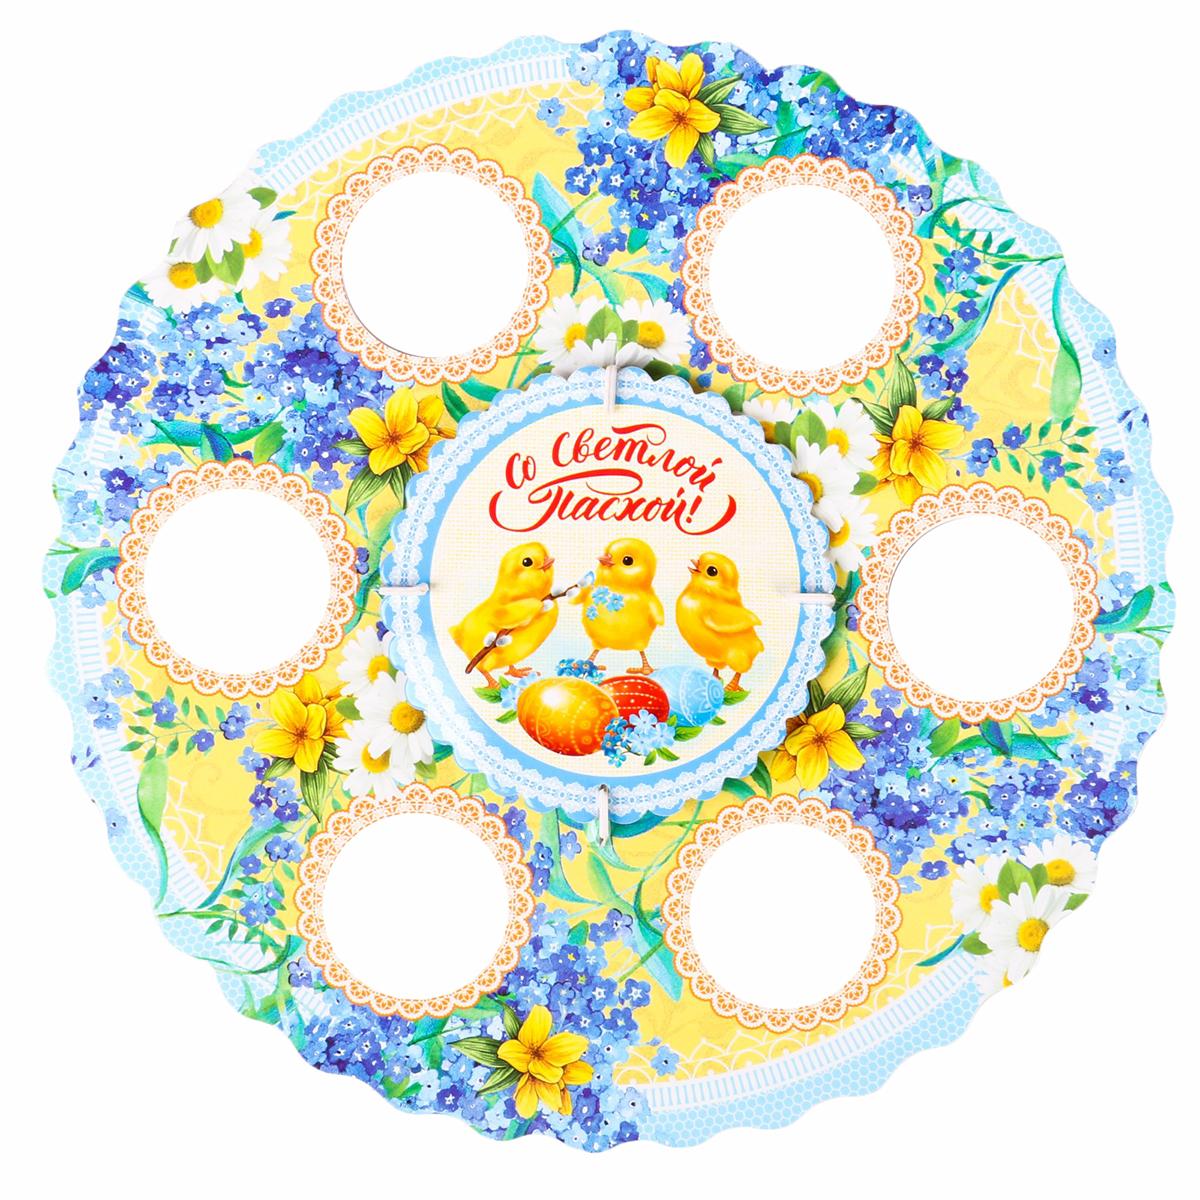 "Подставка для яйца ""Цыплята"", на 6 яиц, 21 х 21 см. 2728327"